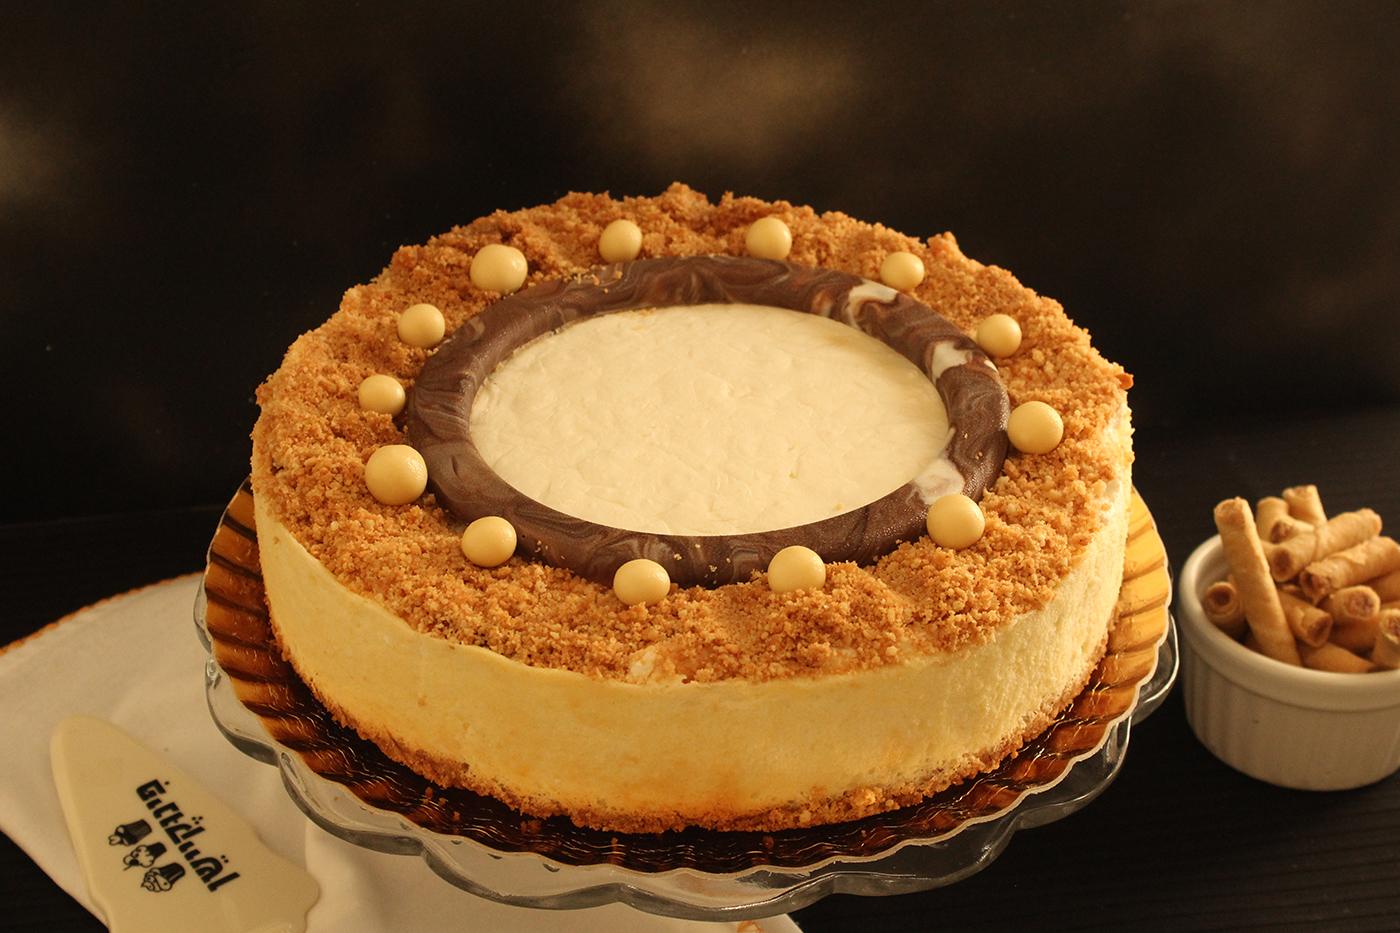 IMG 8281 - עוגת גבינה גבוהה וטעימה